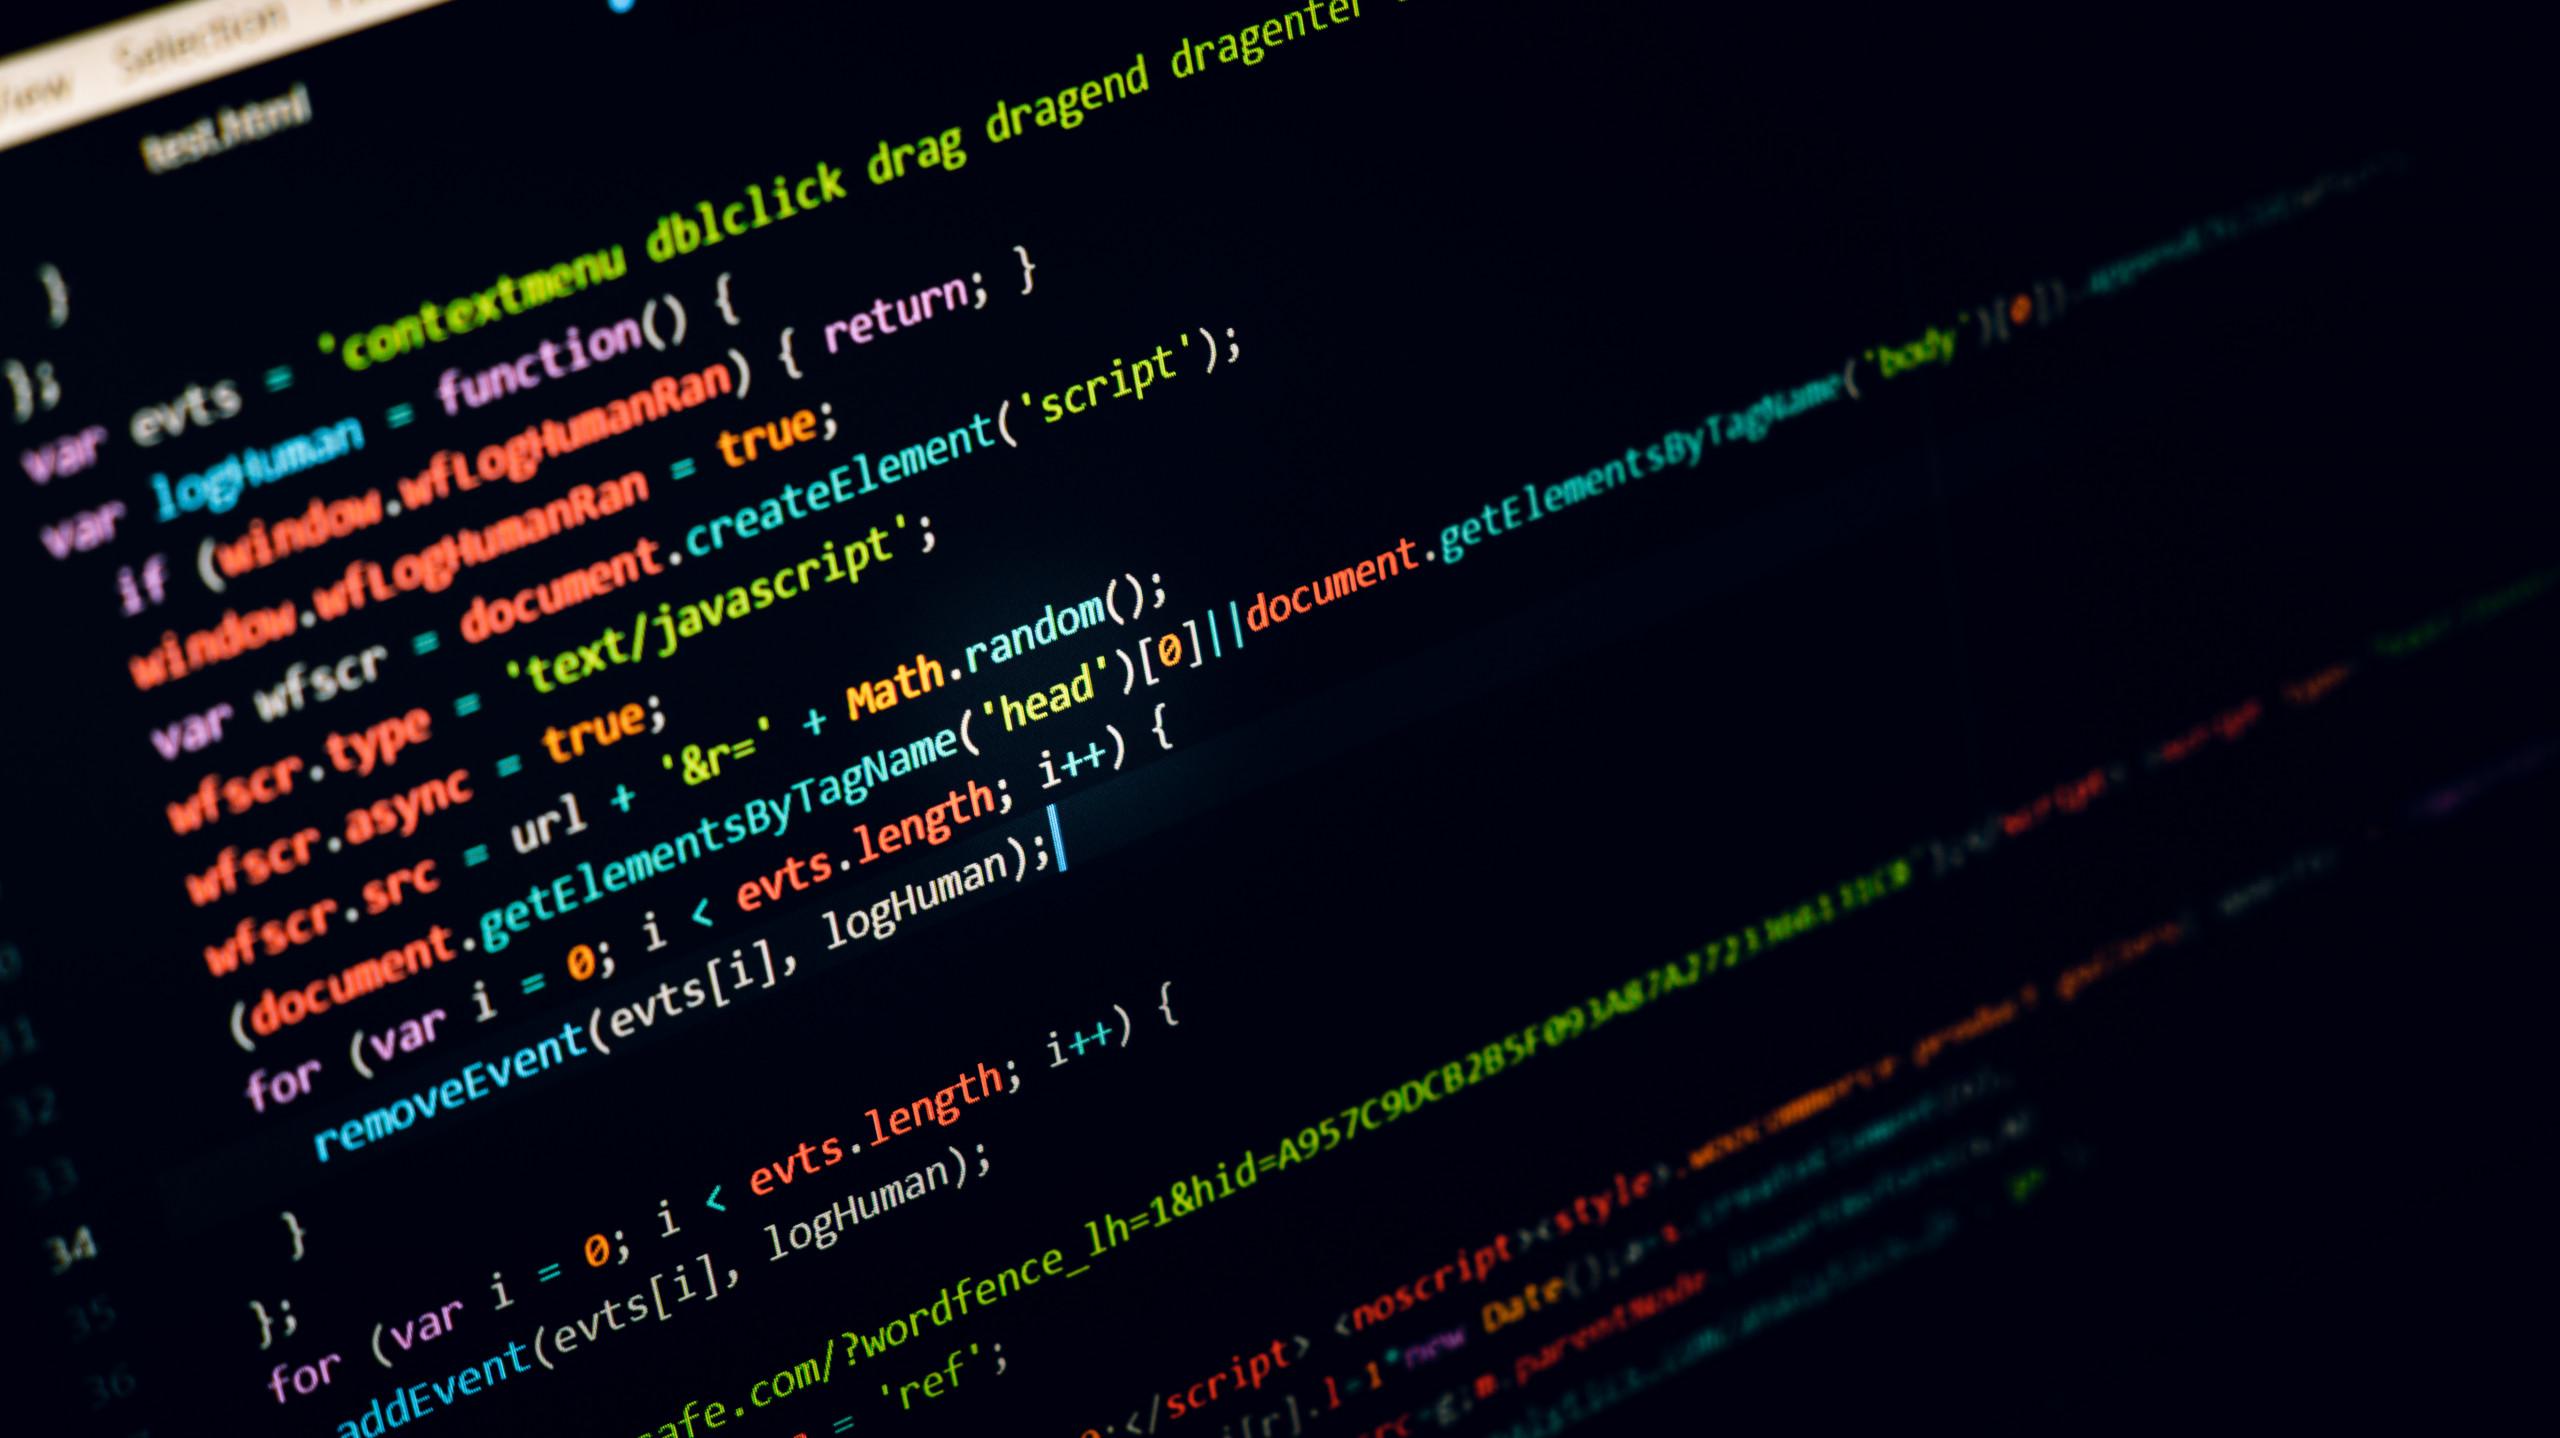 Emsisoft releases WannaCryFake Bitcoin ransomware fix